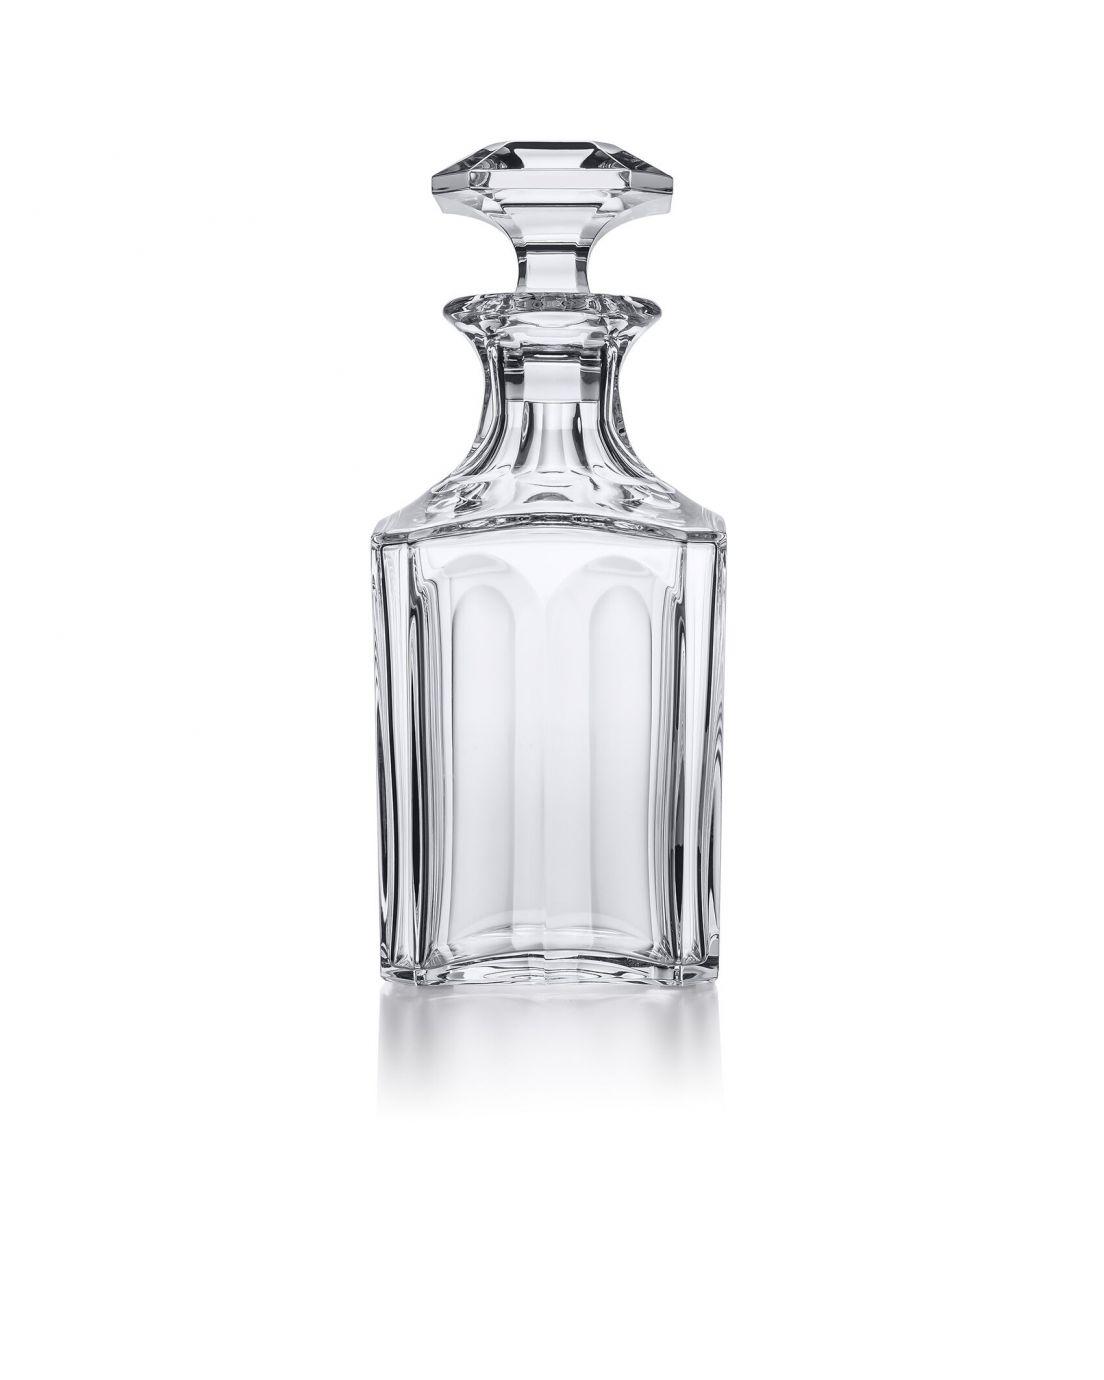 Harcourt 1841 Whiskey Decanter